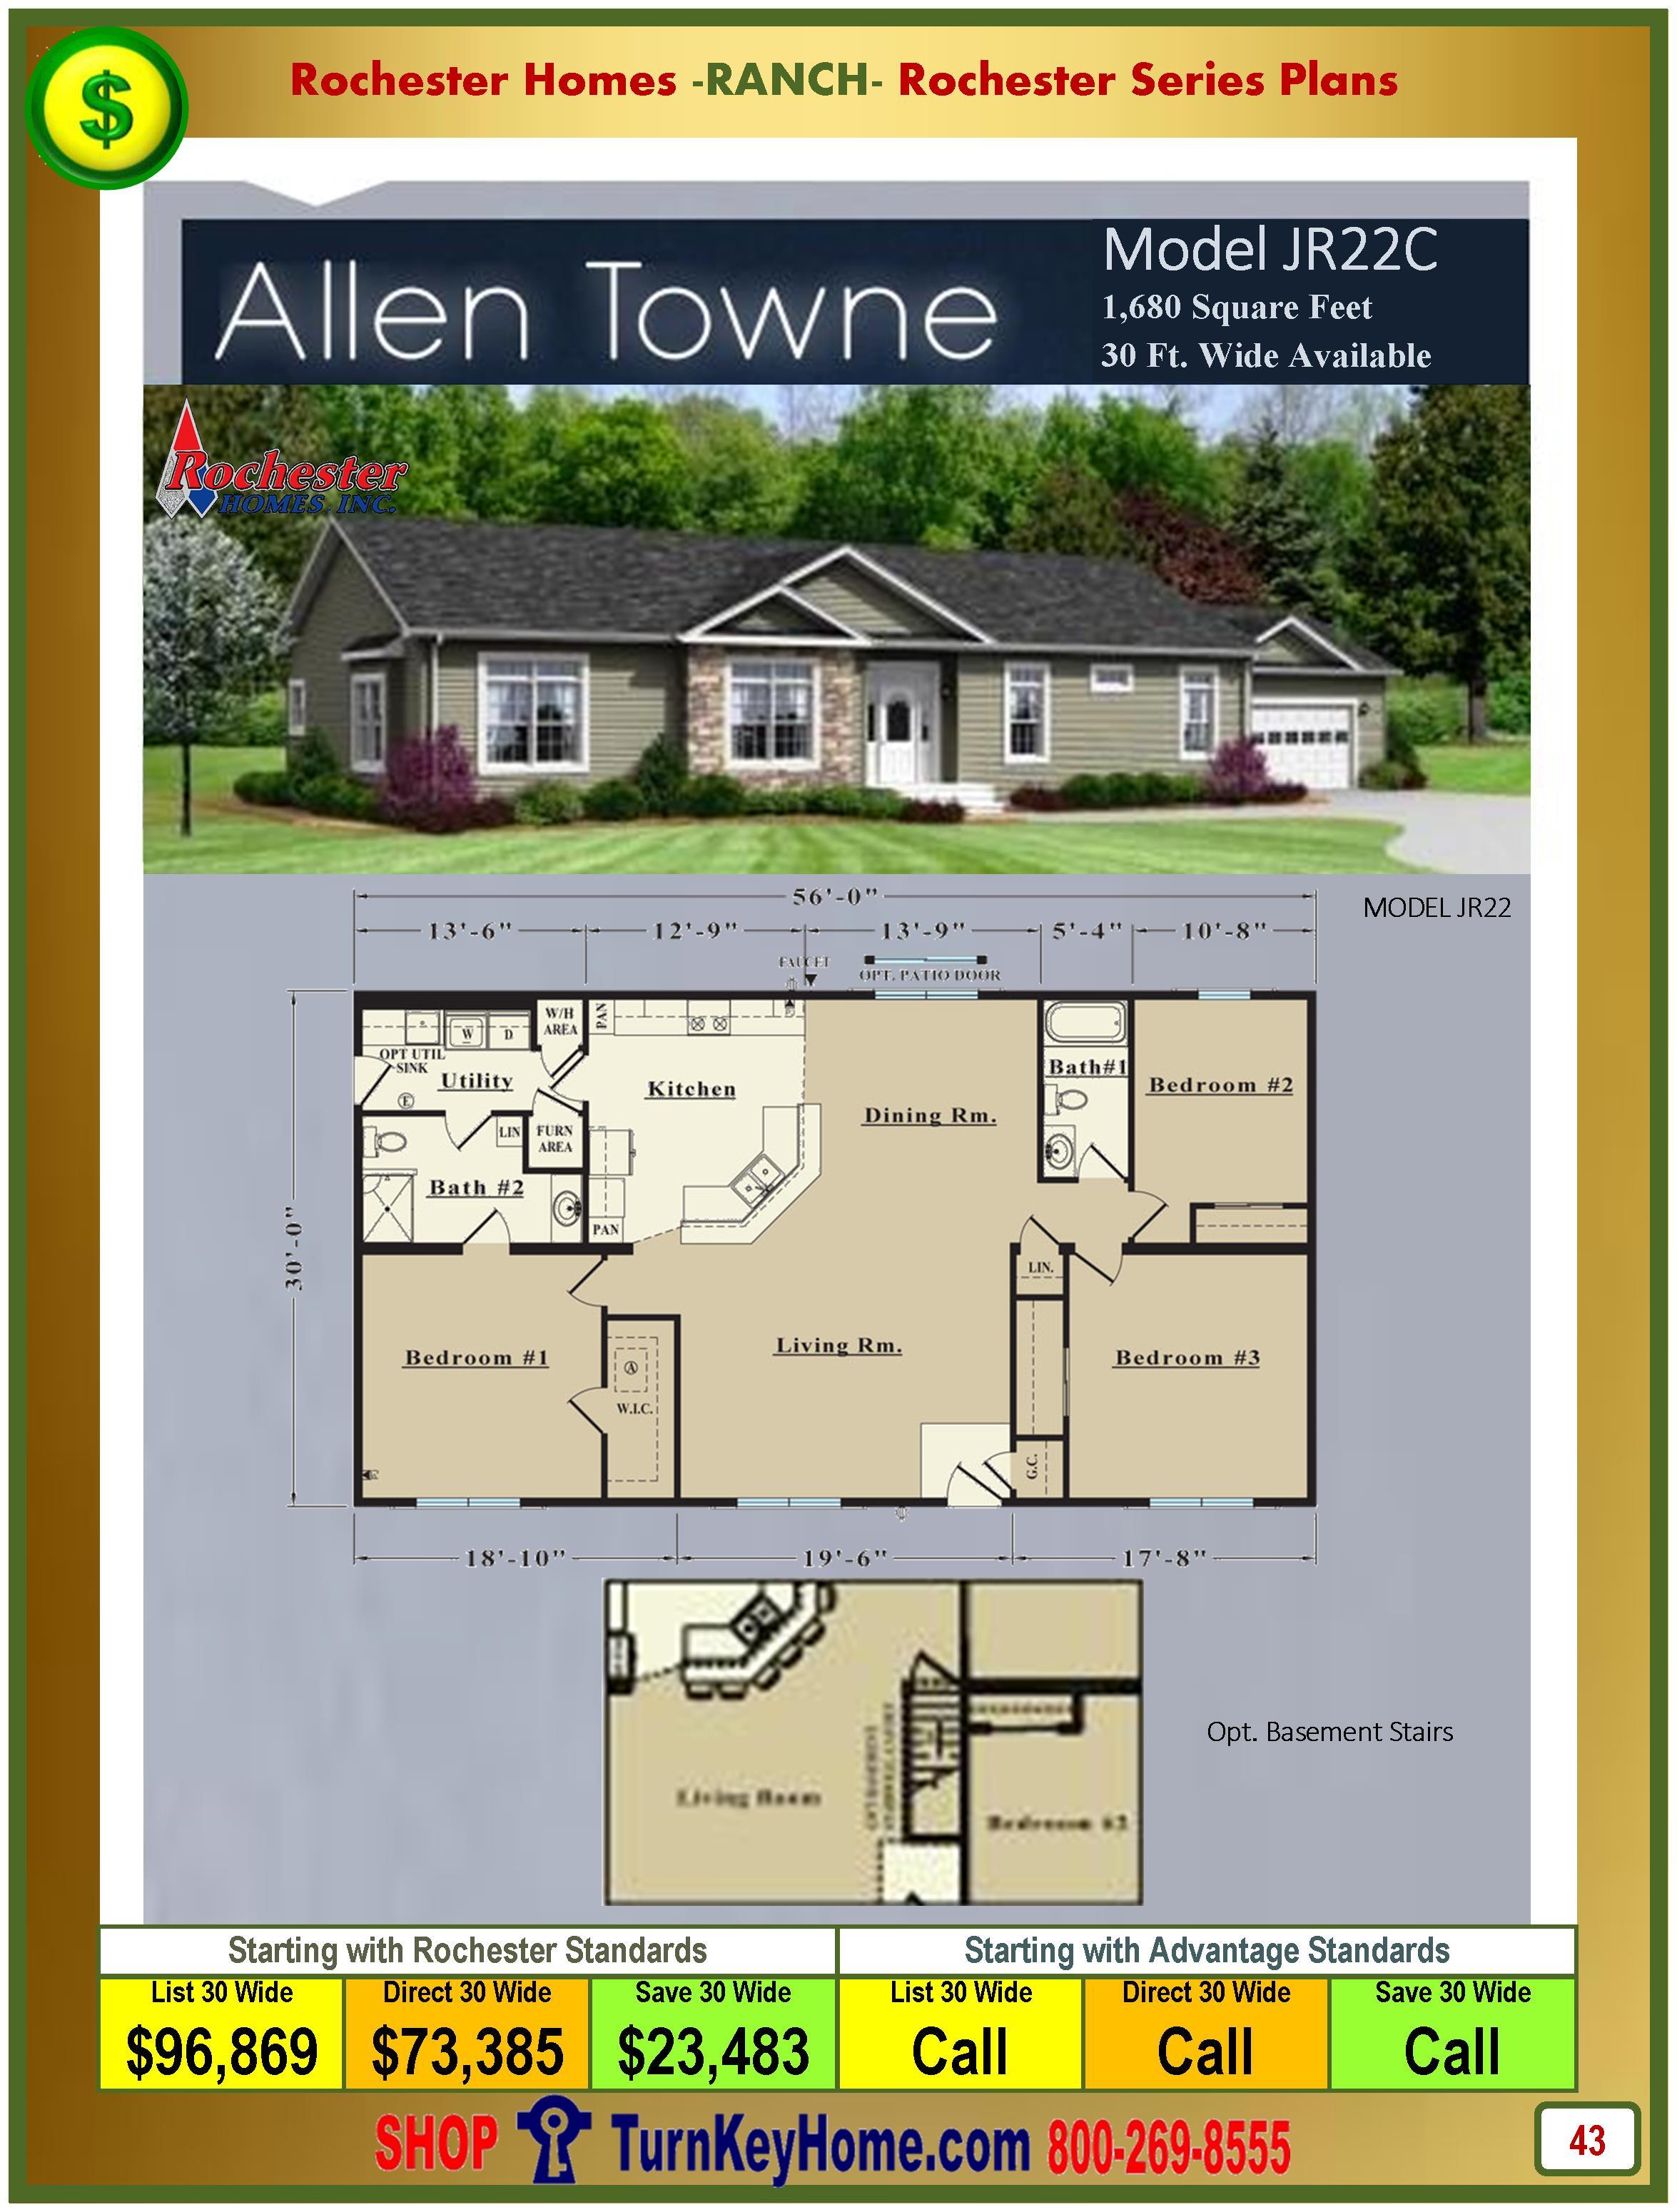 Modular.Homes.Rochester.Home.Inc.Allen.Towne.JR22C.Ranch.Plan.Price.Catalog.P43